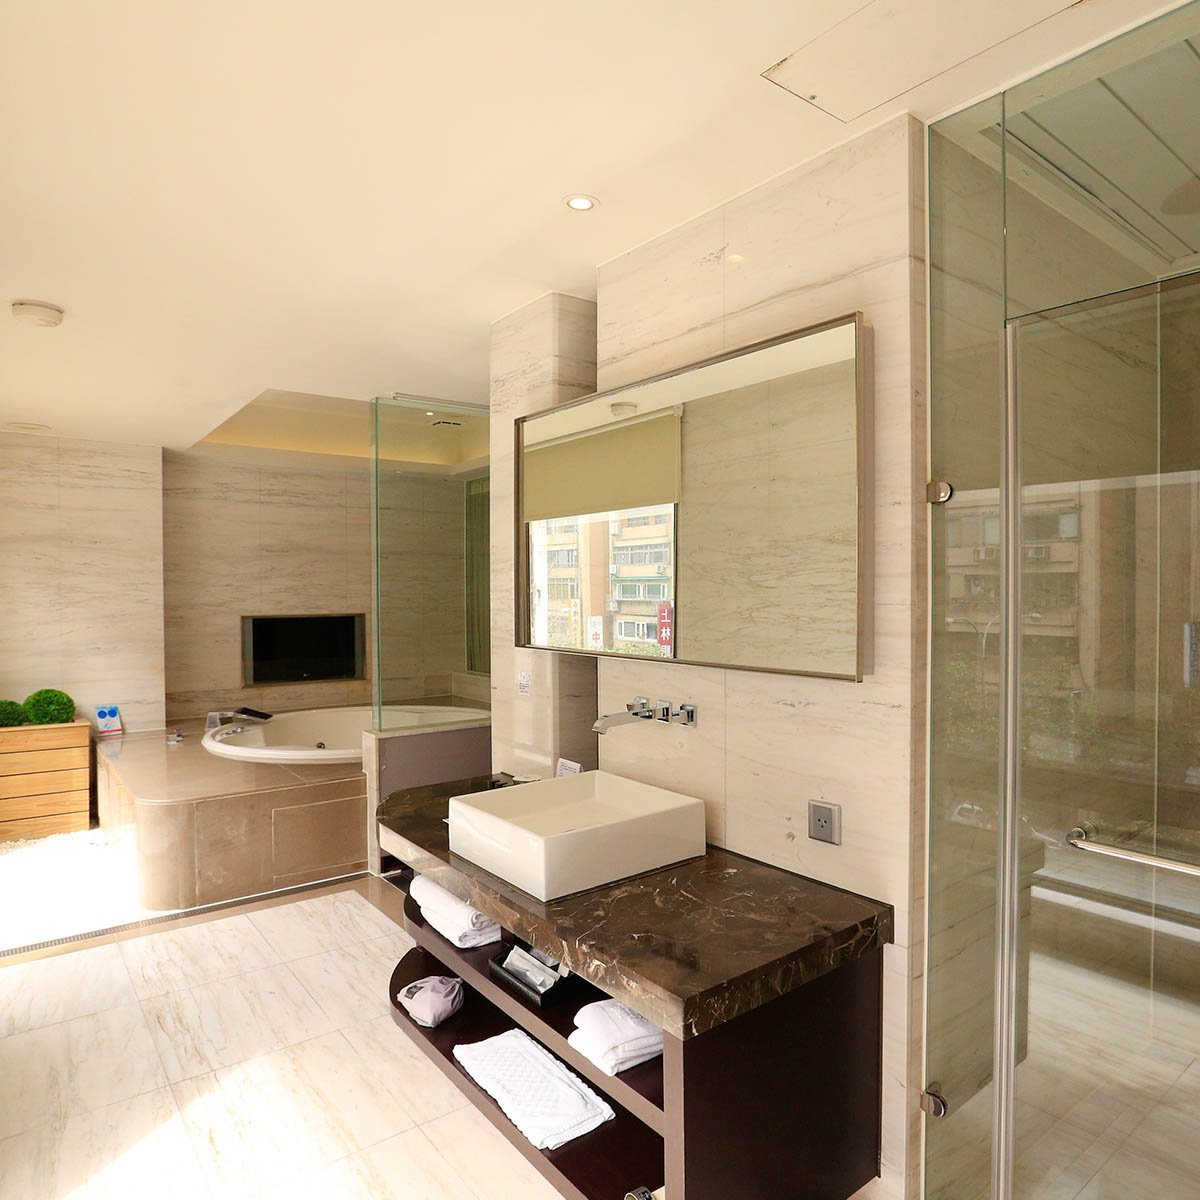 steam-room-and-bathtub